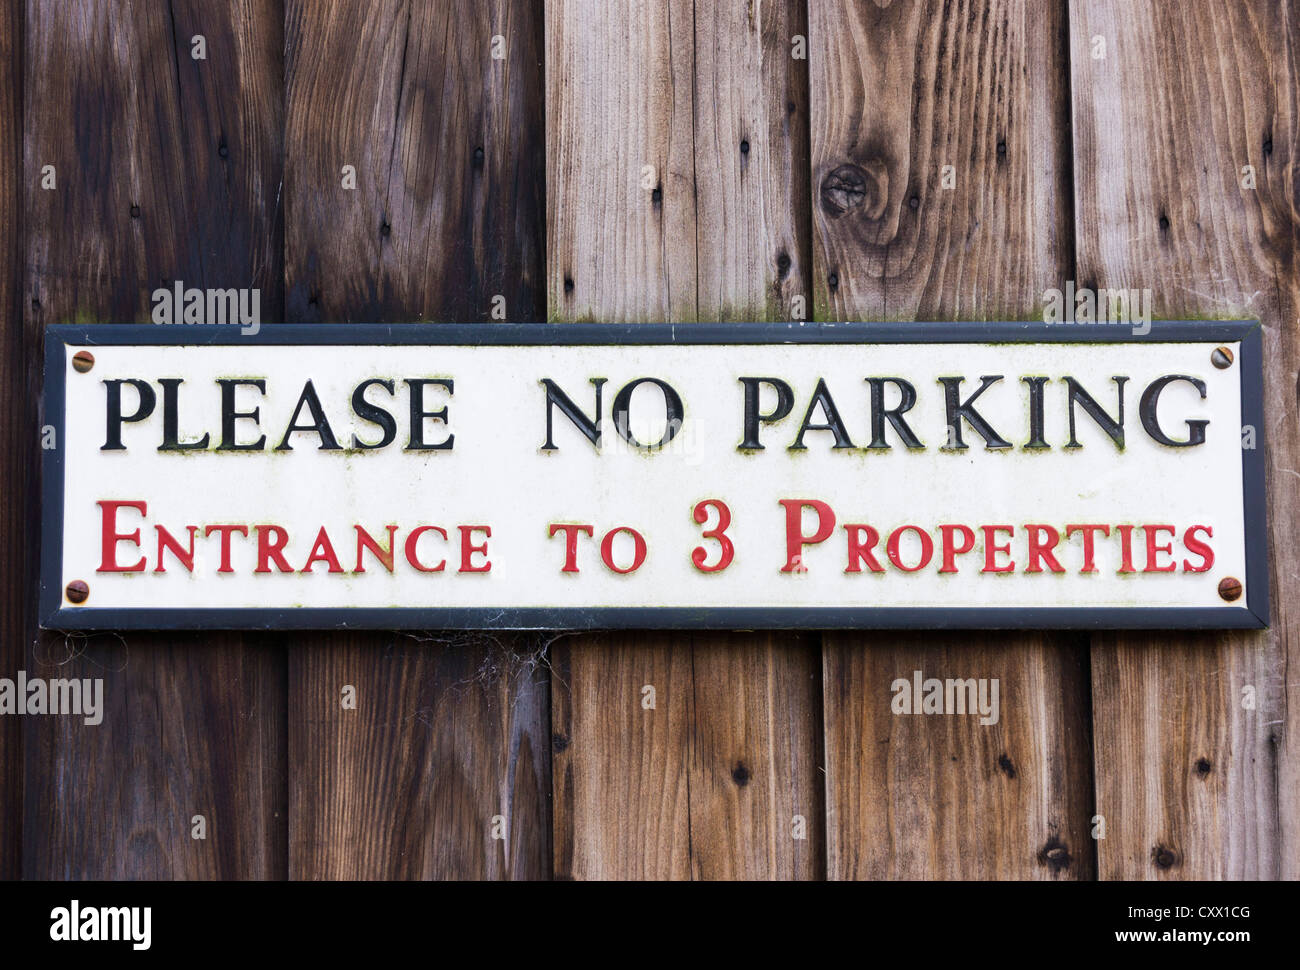 Please no parking sign UK - Stock Image